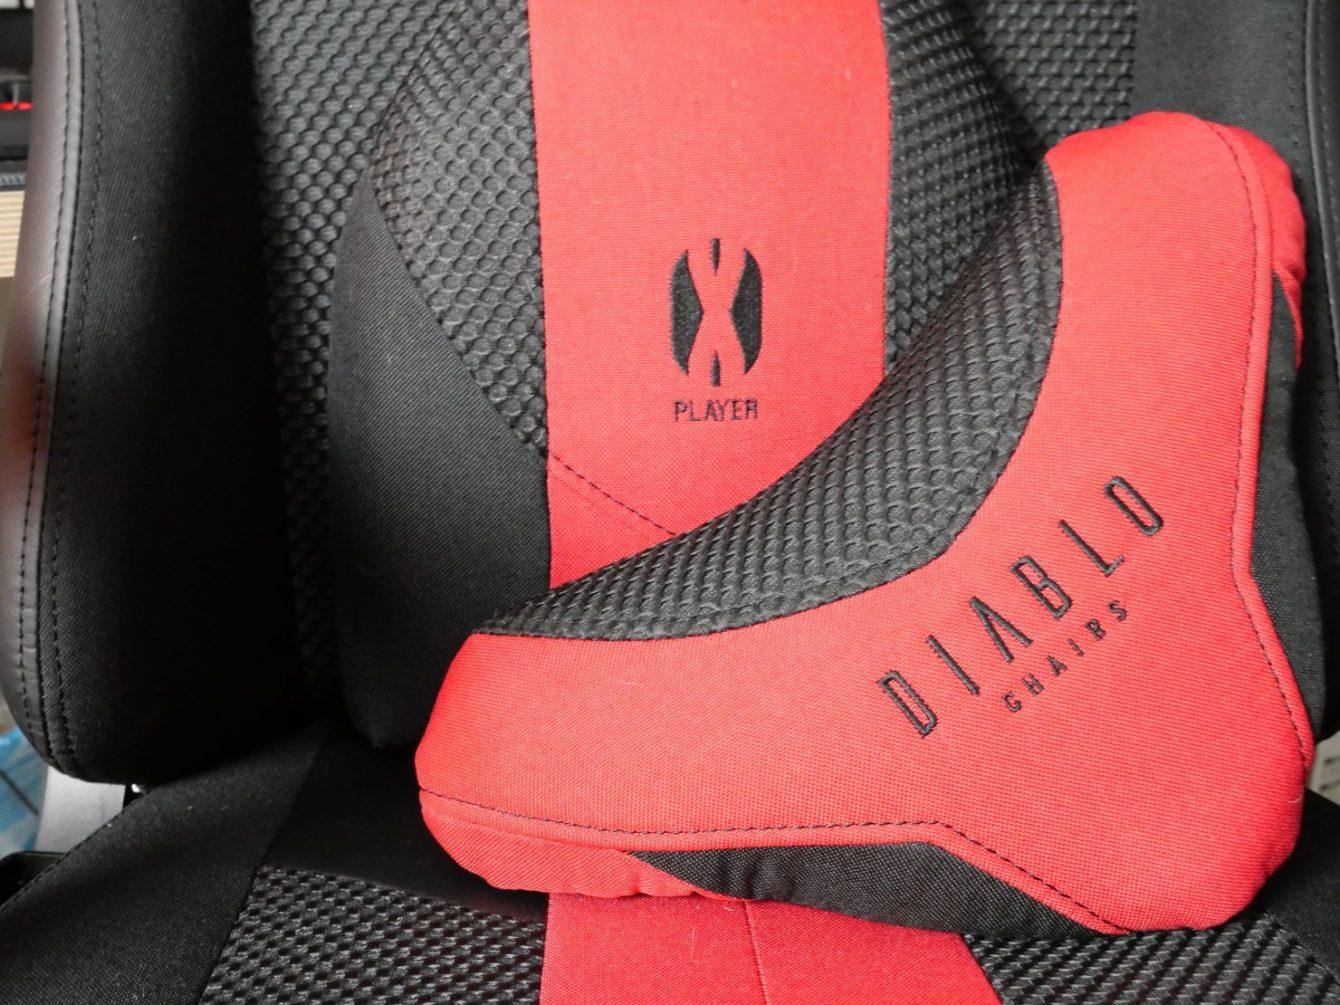 Diablo X-Player 2.0 review: the devilish Diablo Chairs gaming chair